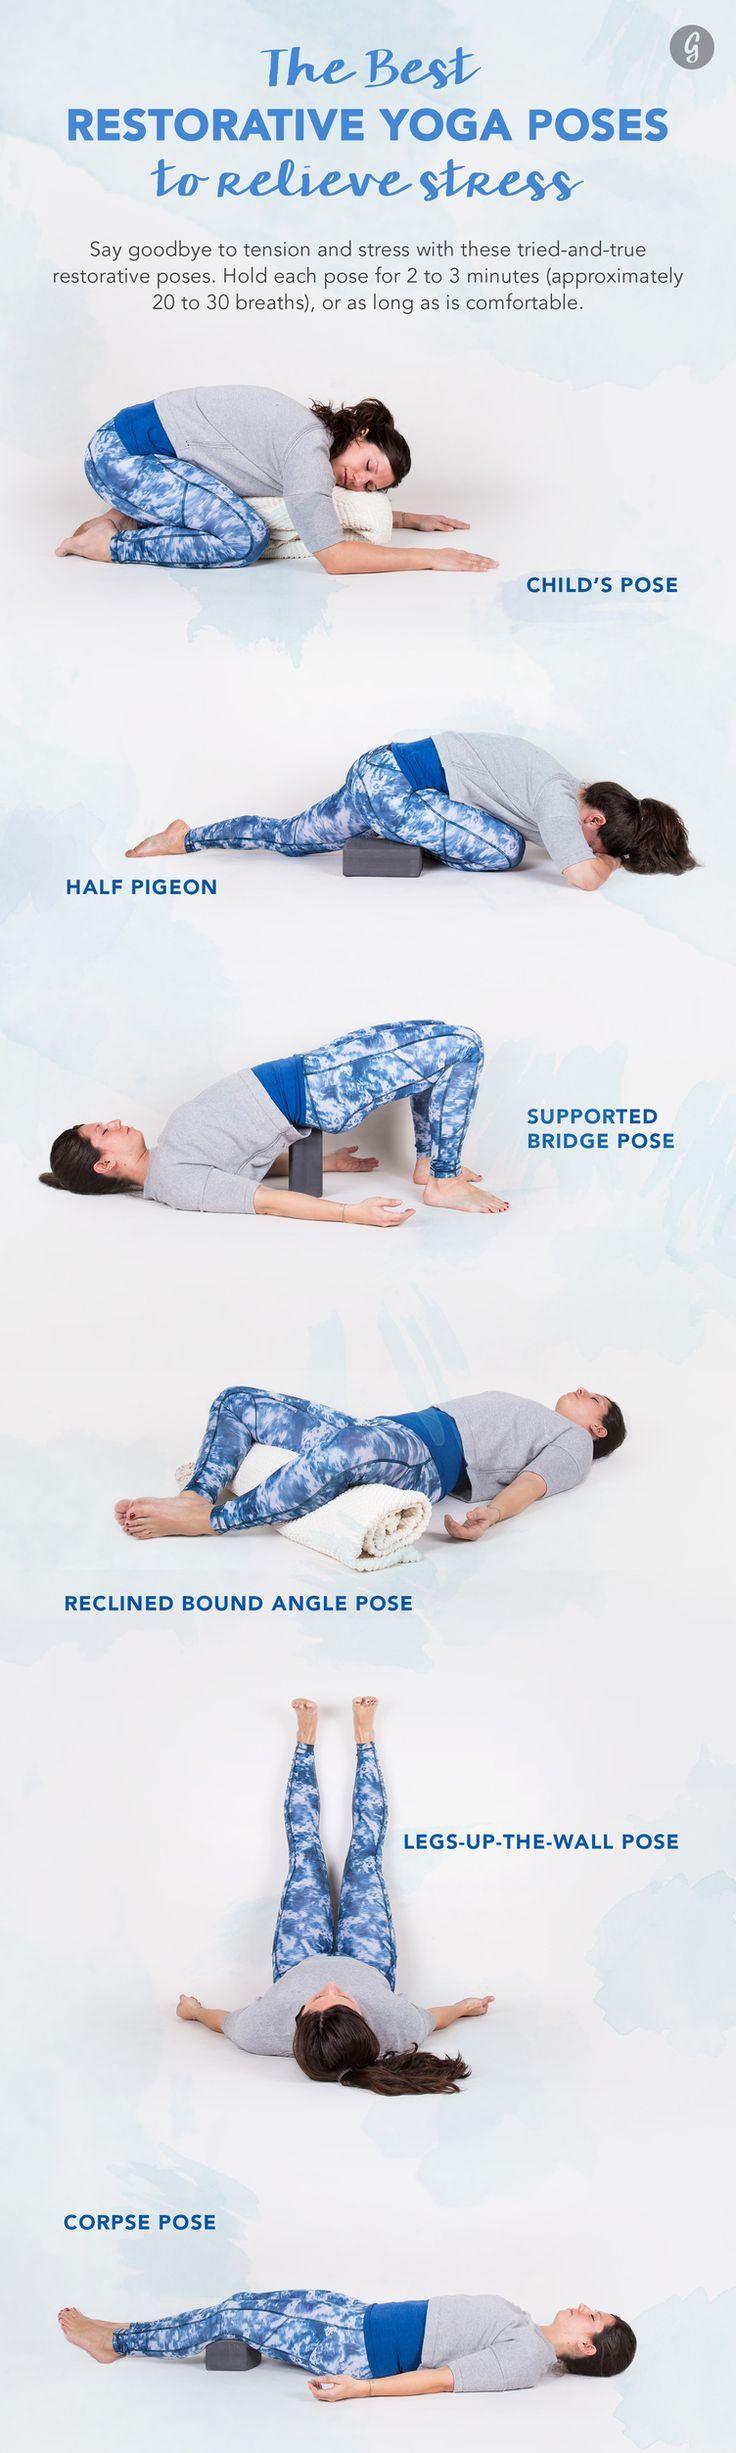 Restorative Yoga Poses Before Bed